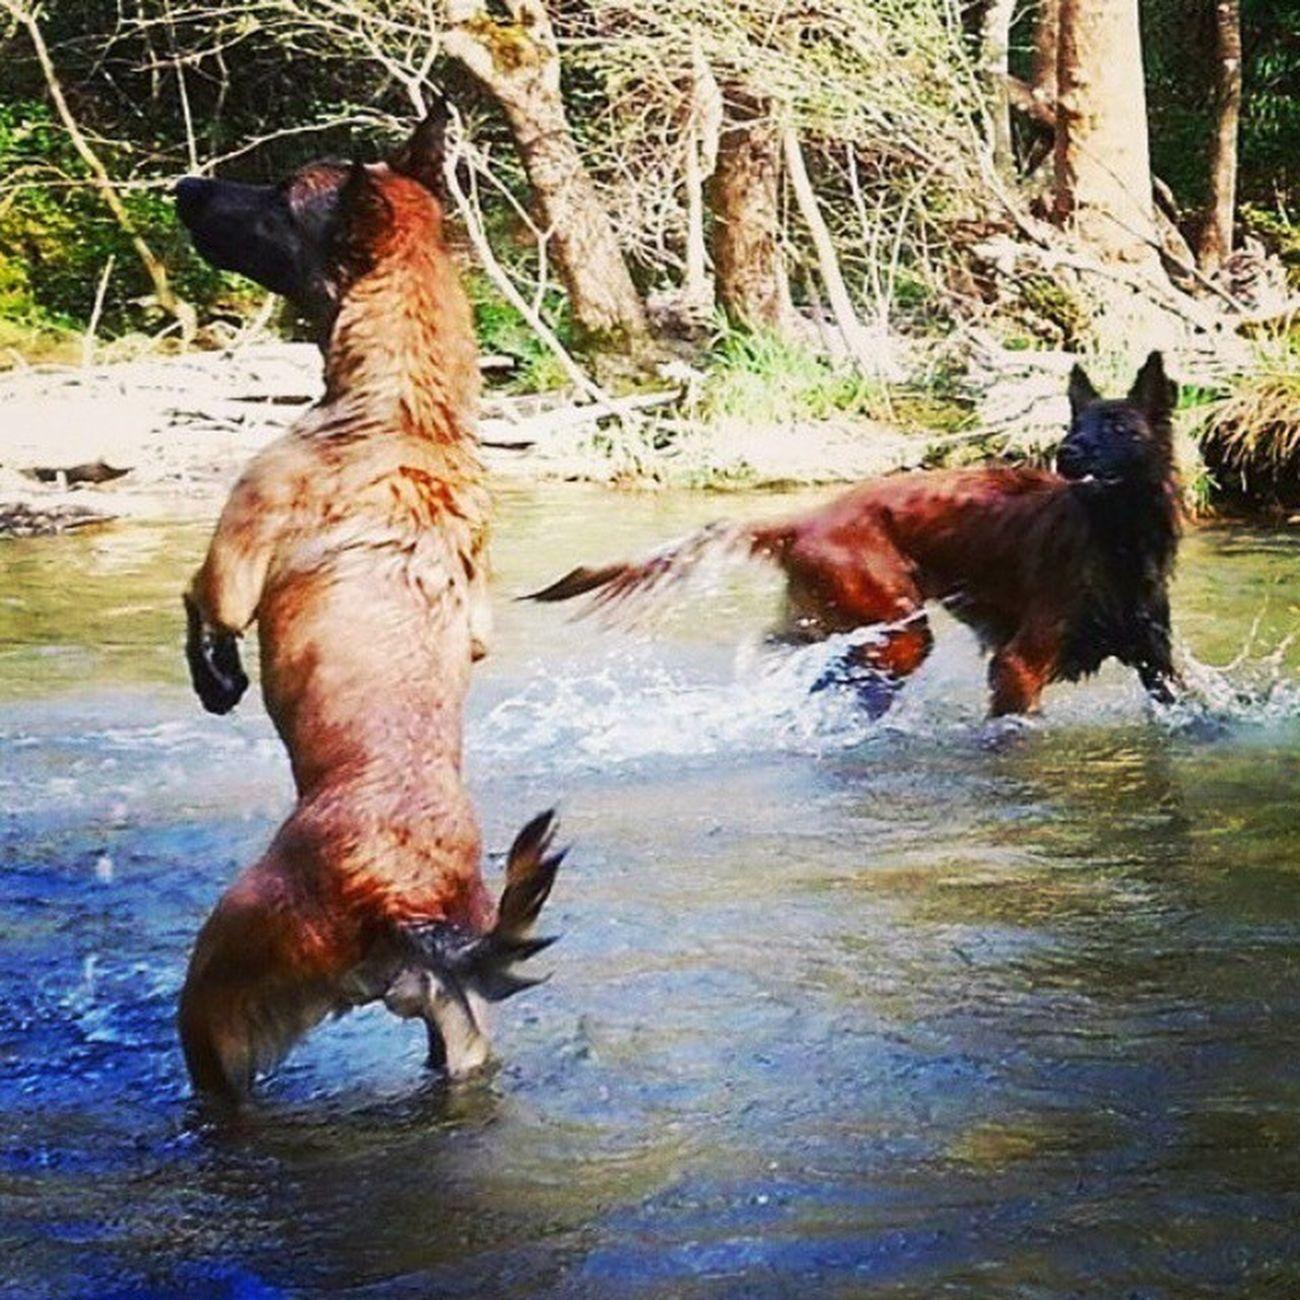 Mia et Jumper ♡ Dogs Malinois Tervueren Baignade Tranquillade